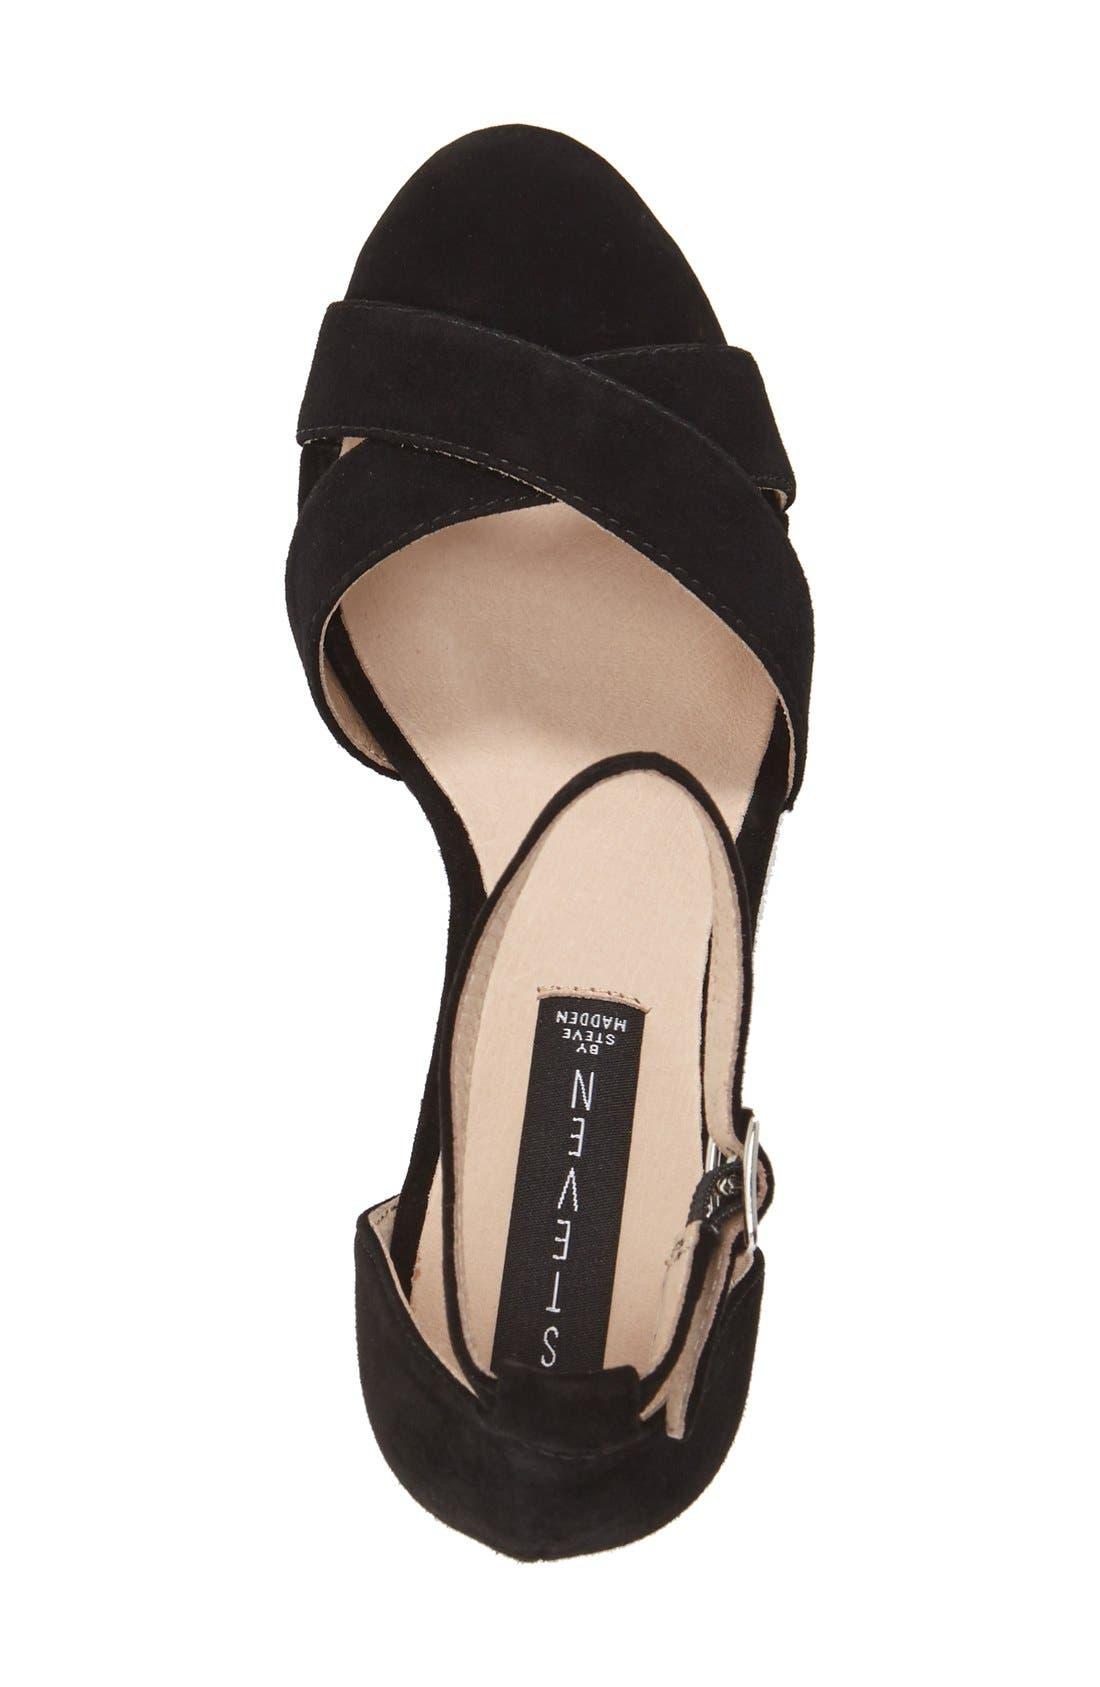 'Voomme' Ankle Strap Sandal,                             Alternate thumbnail 5, color,